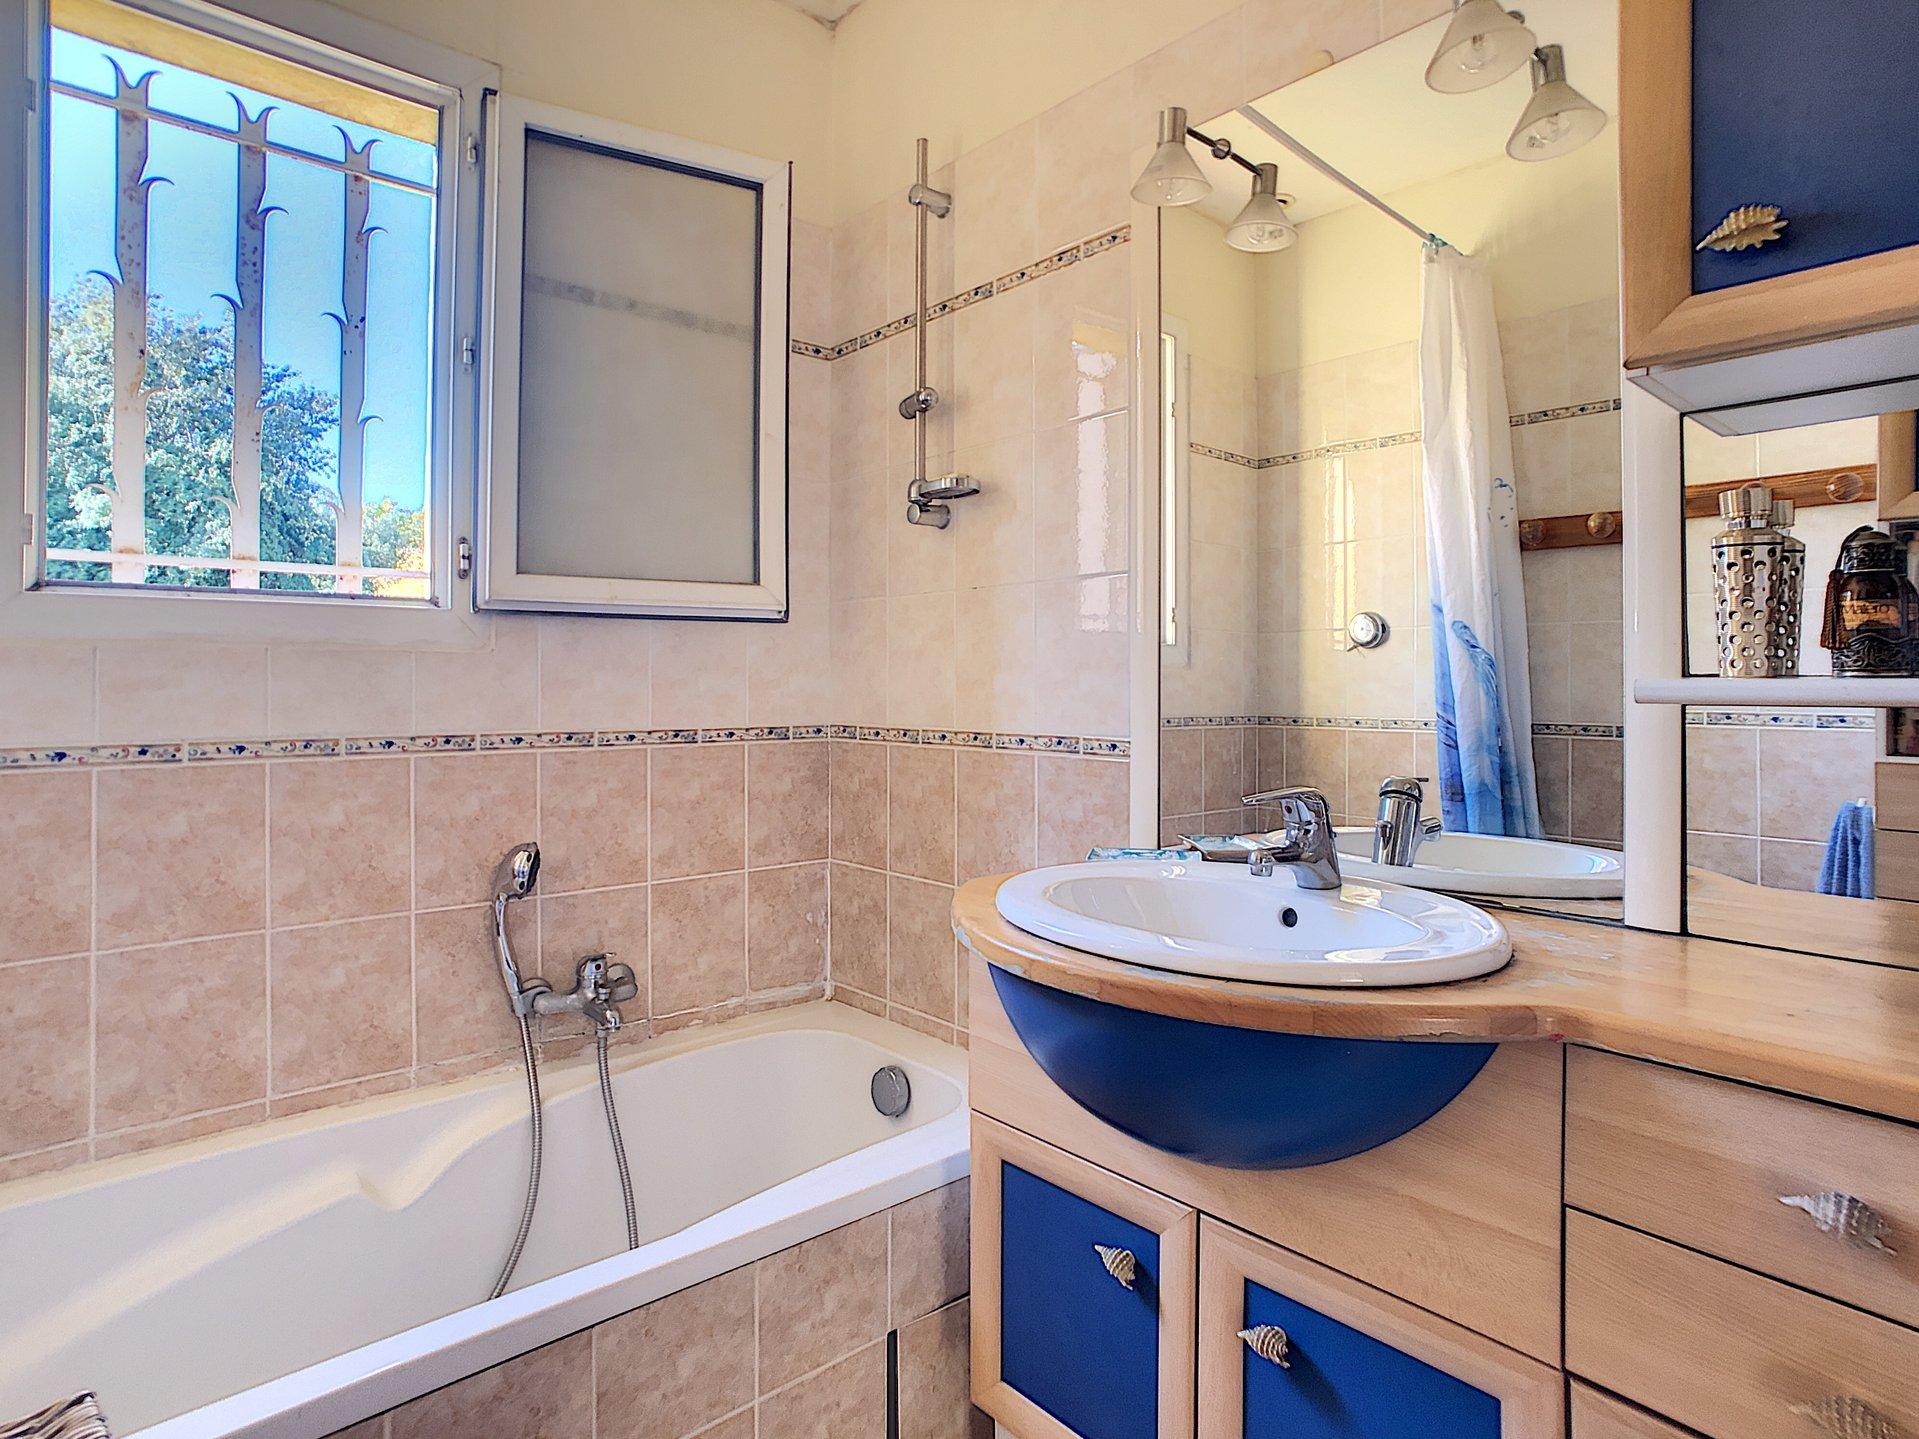 Grasse St Jacques, 3 Bedrooms villa